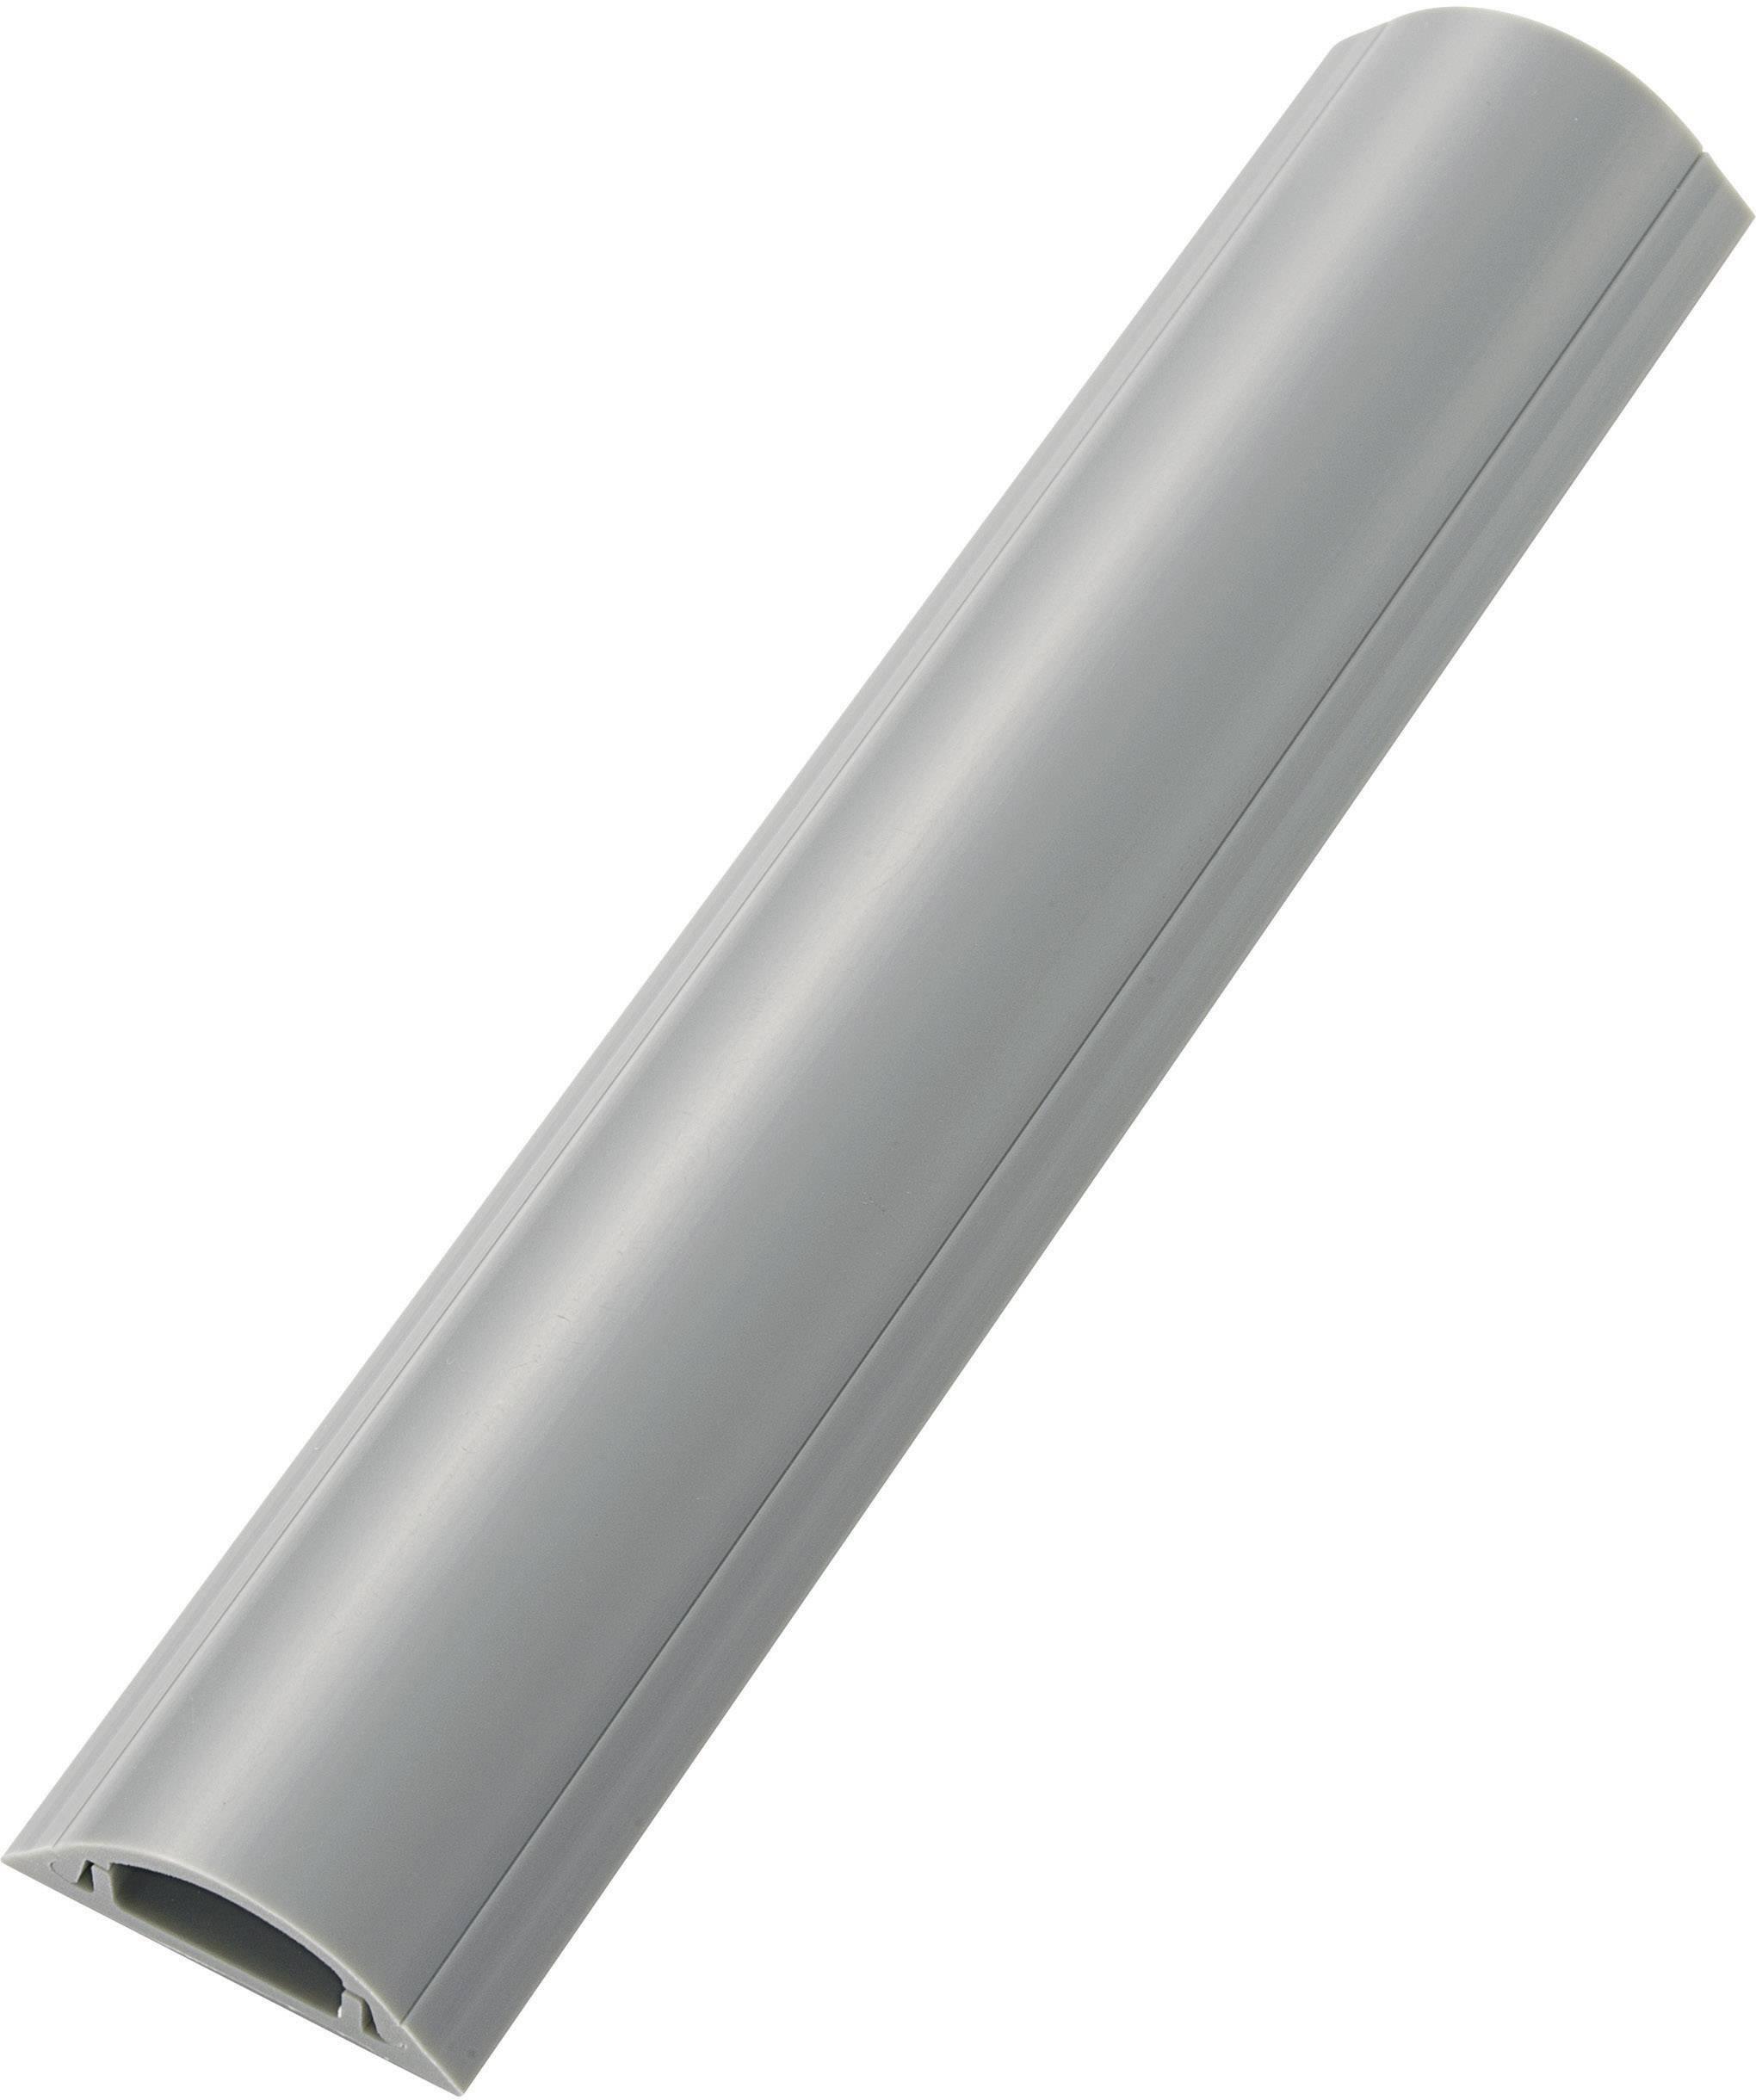 Káblový mostík KSS 547567 RDAR30AWM, (d x š x v) 100 x 2.88 x 0.74 cm, sivá, 1 ks